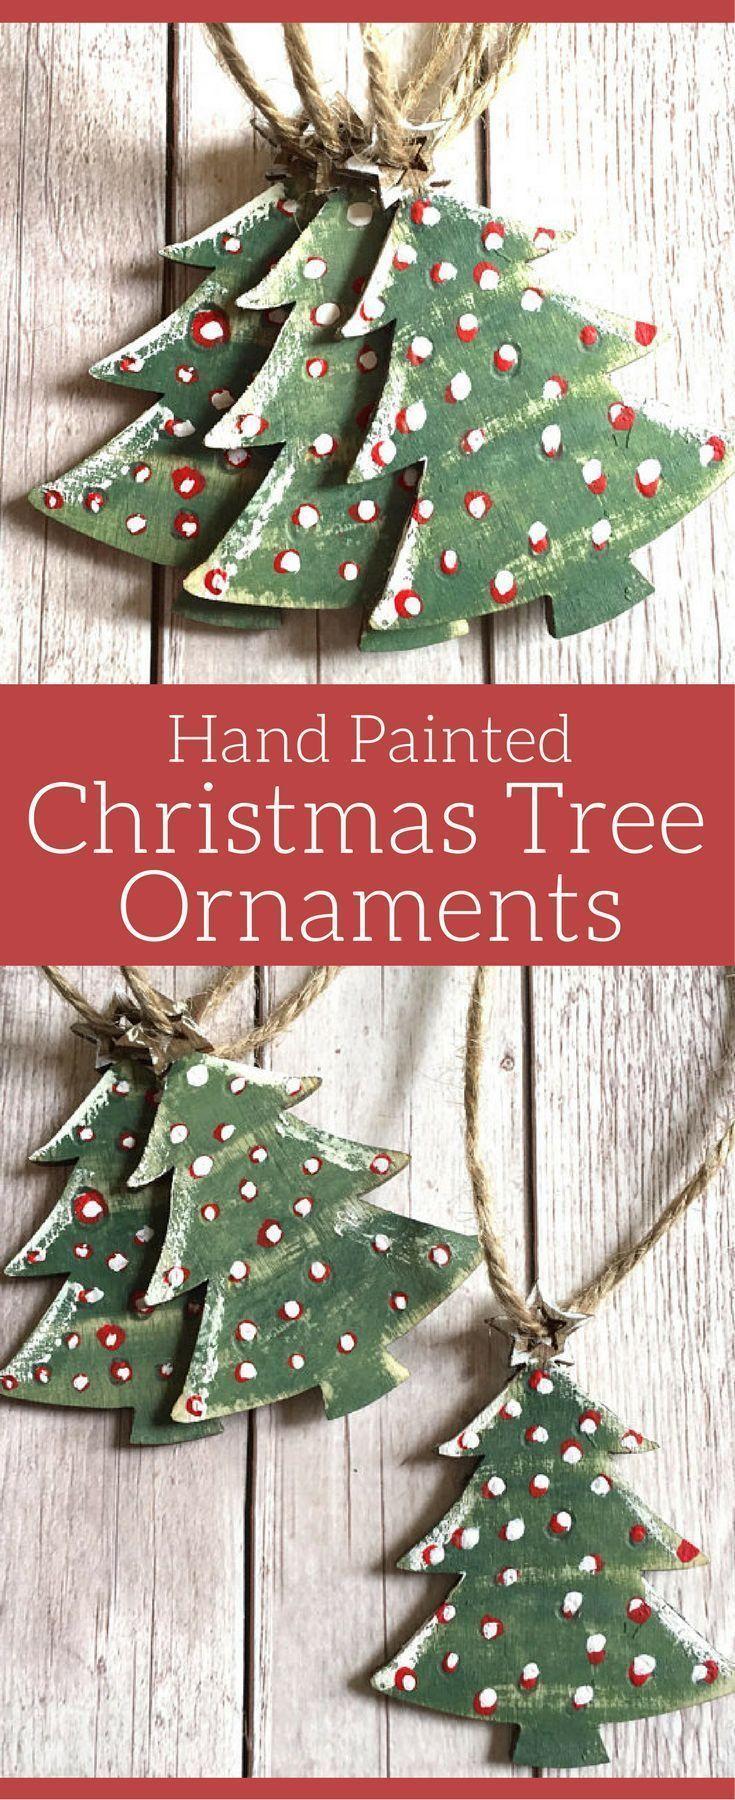 Pin By Karen Beach On Christmas Ornaments Pinterest Vianočné Trhy